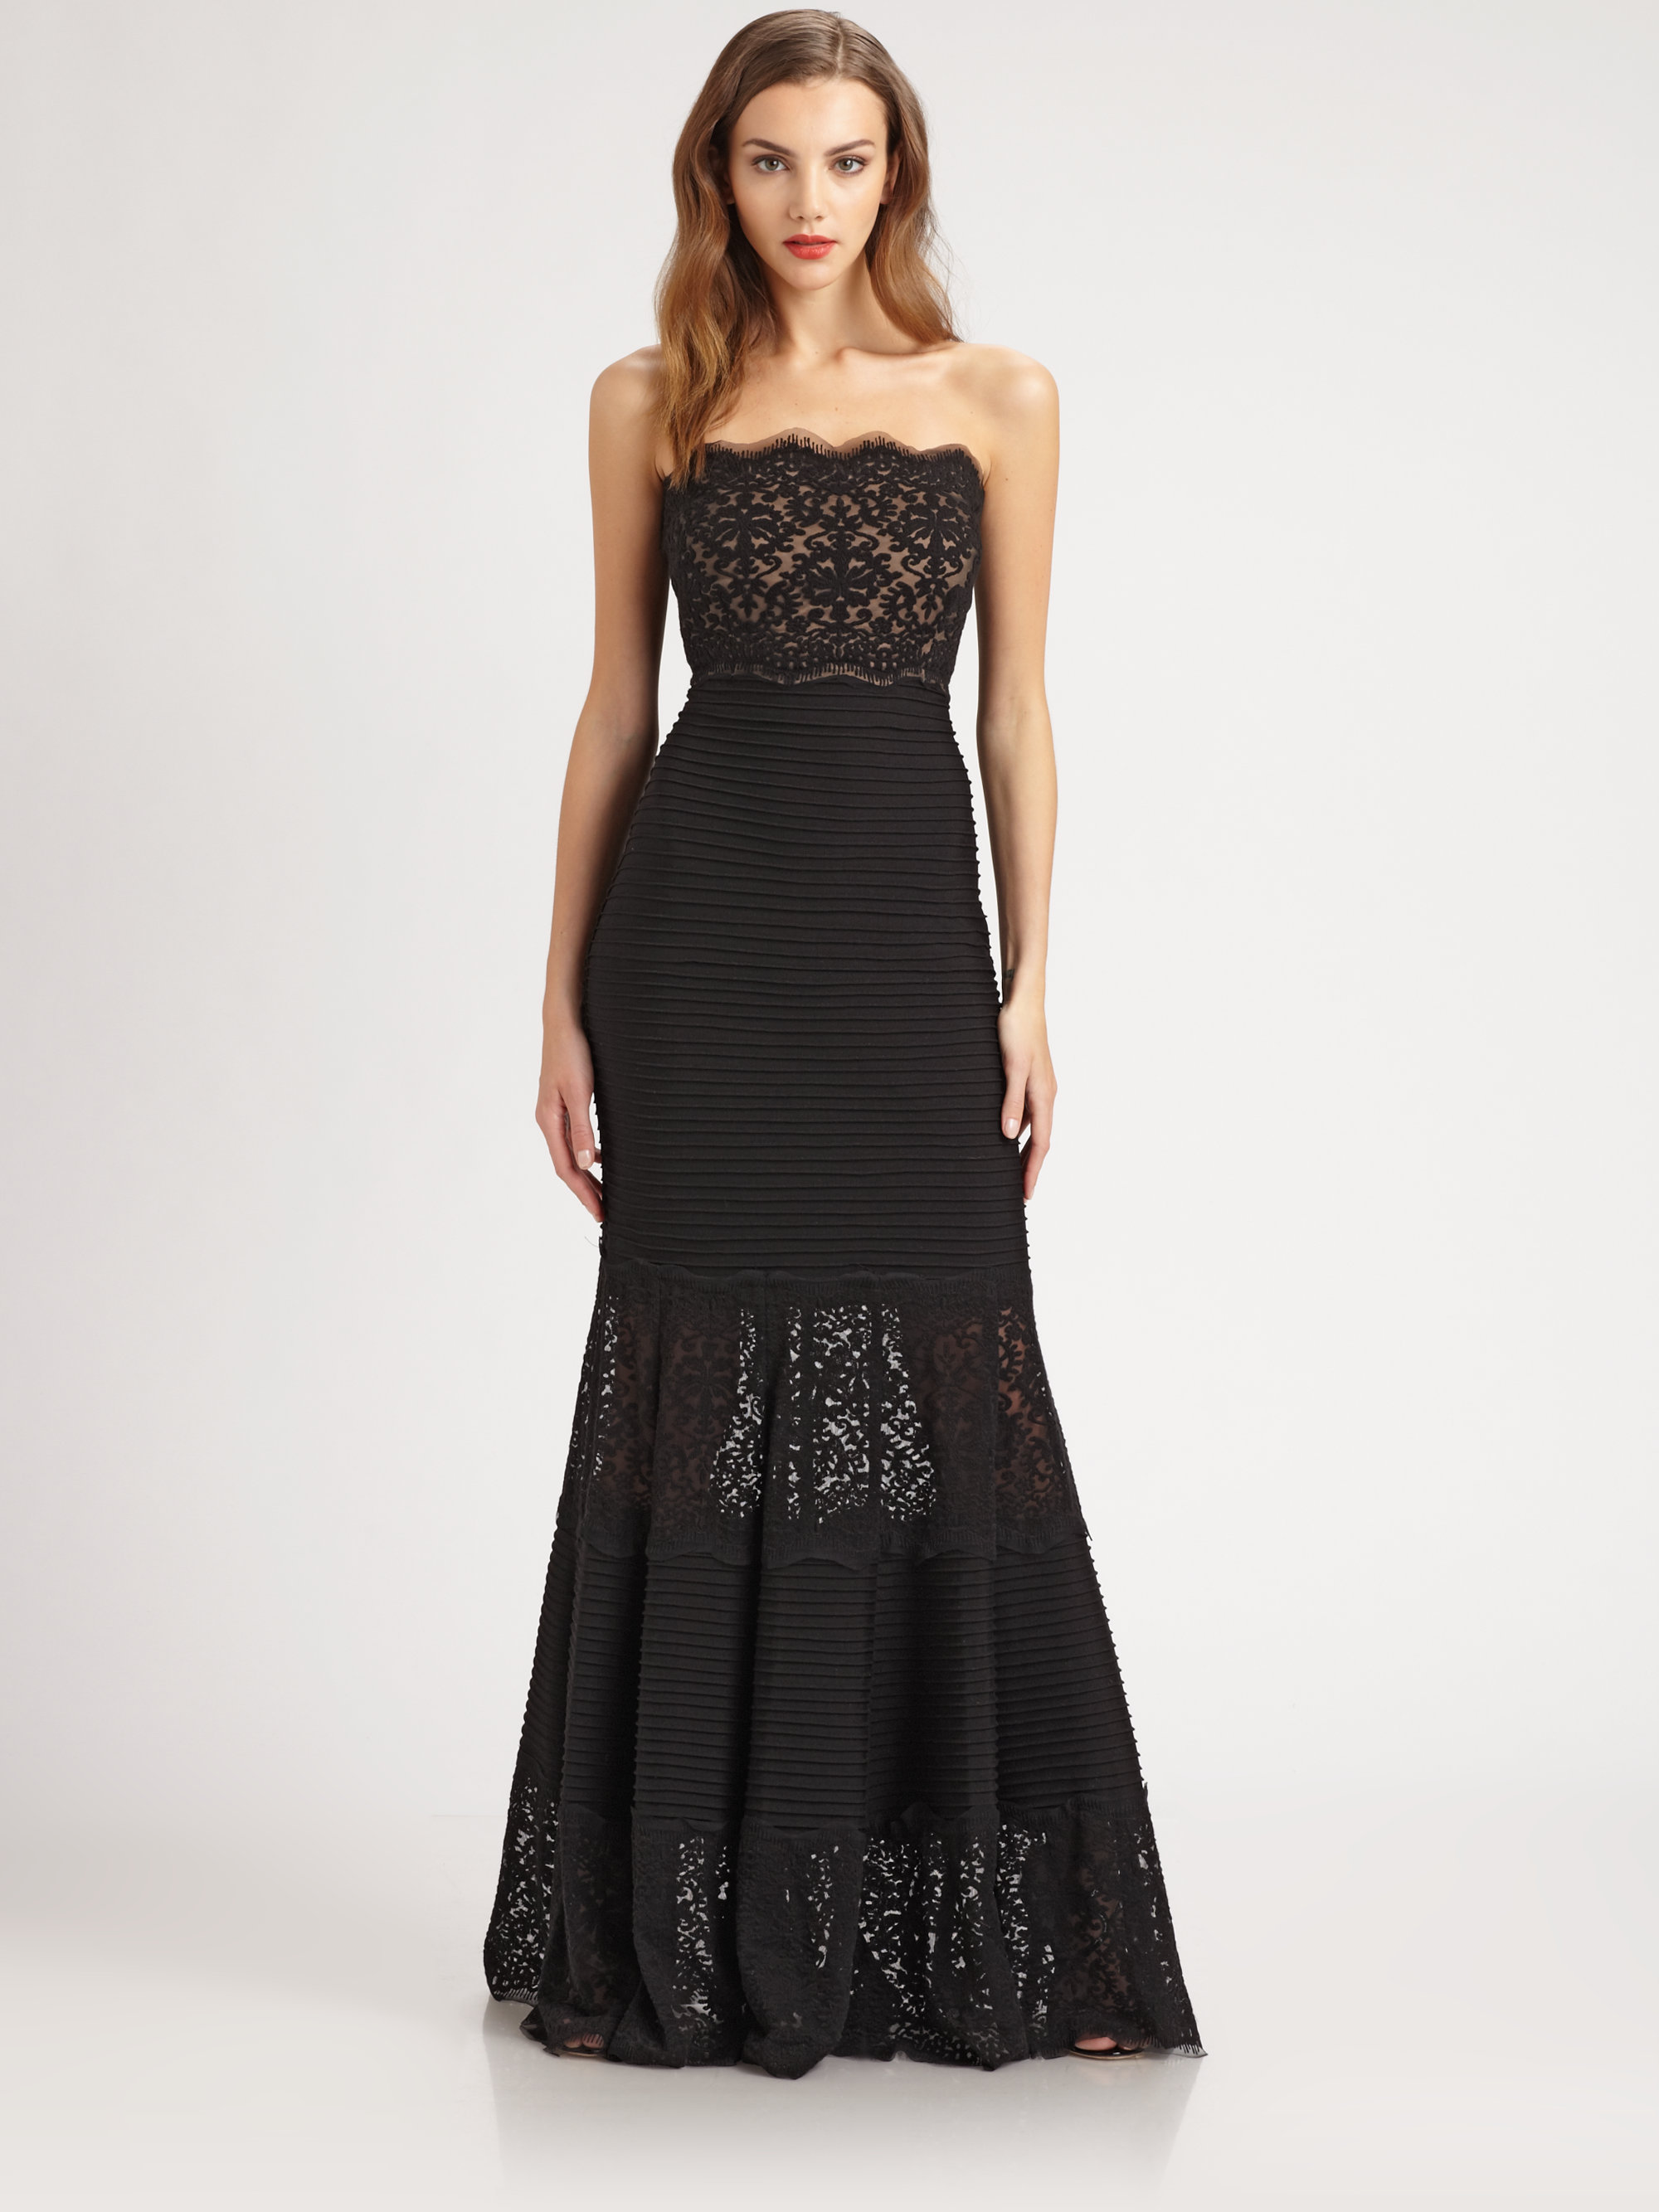 Tadashi Shoji Strapless Pintuck Dress In Black Lyst